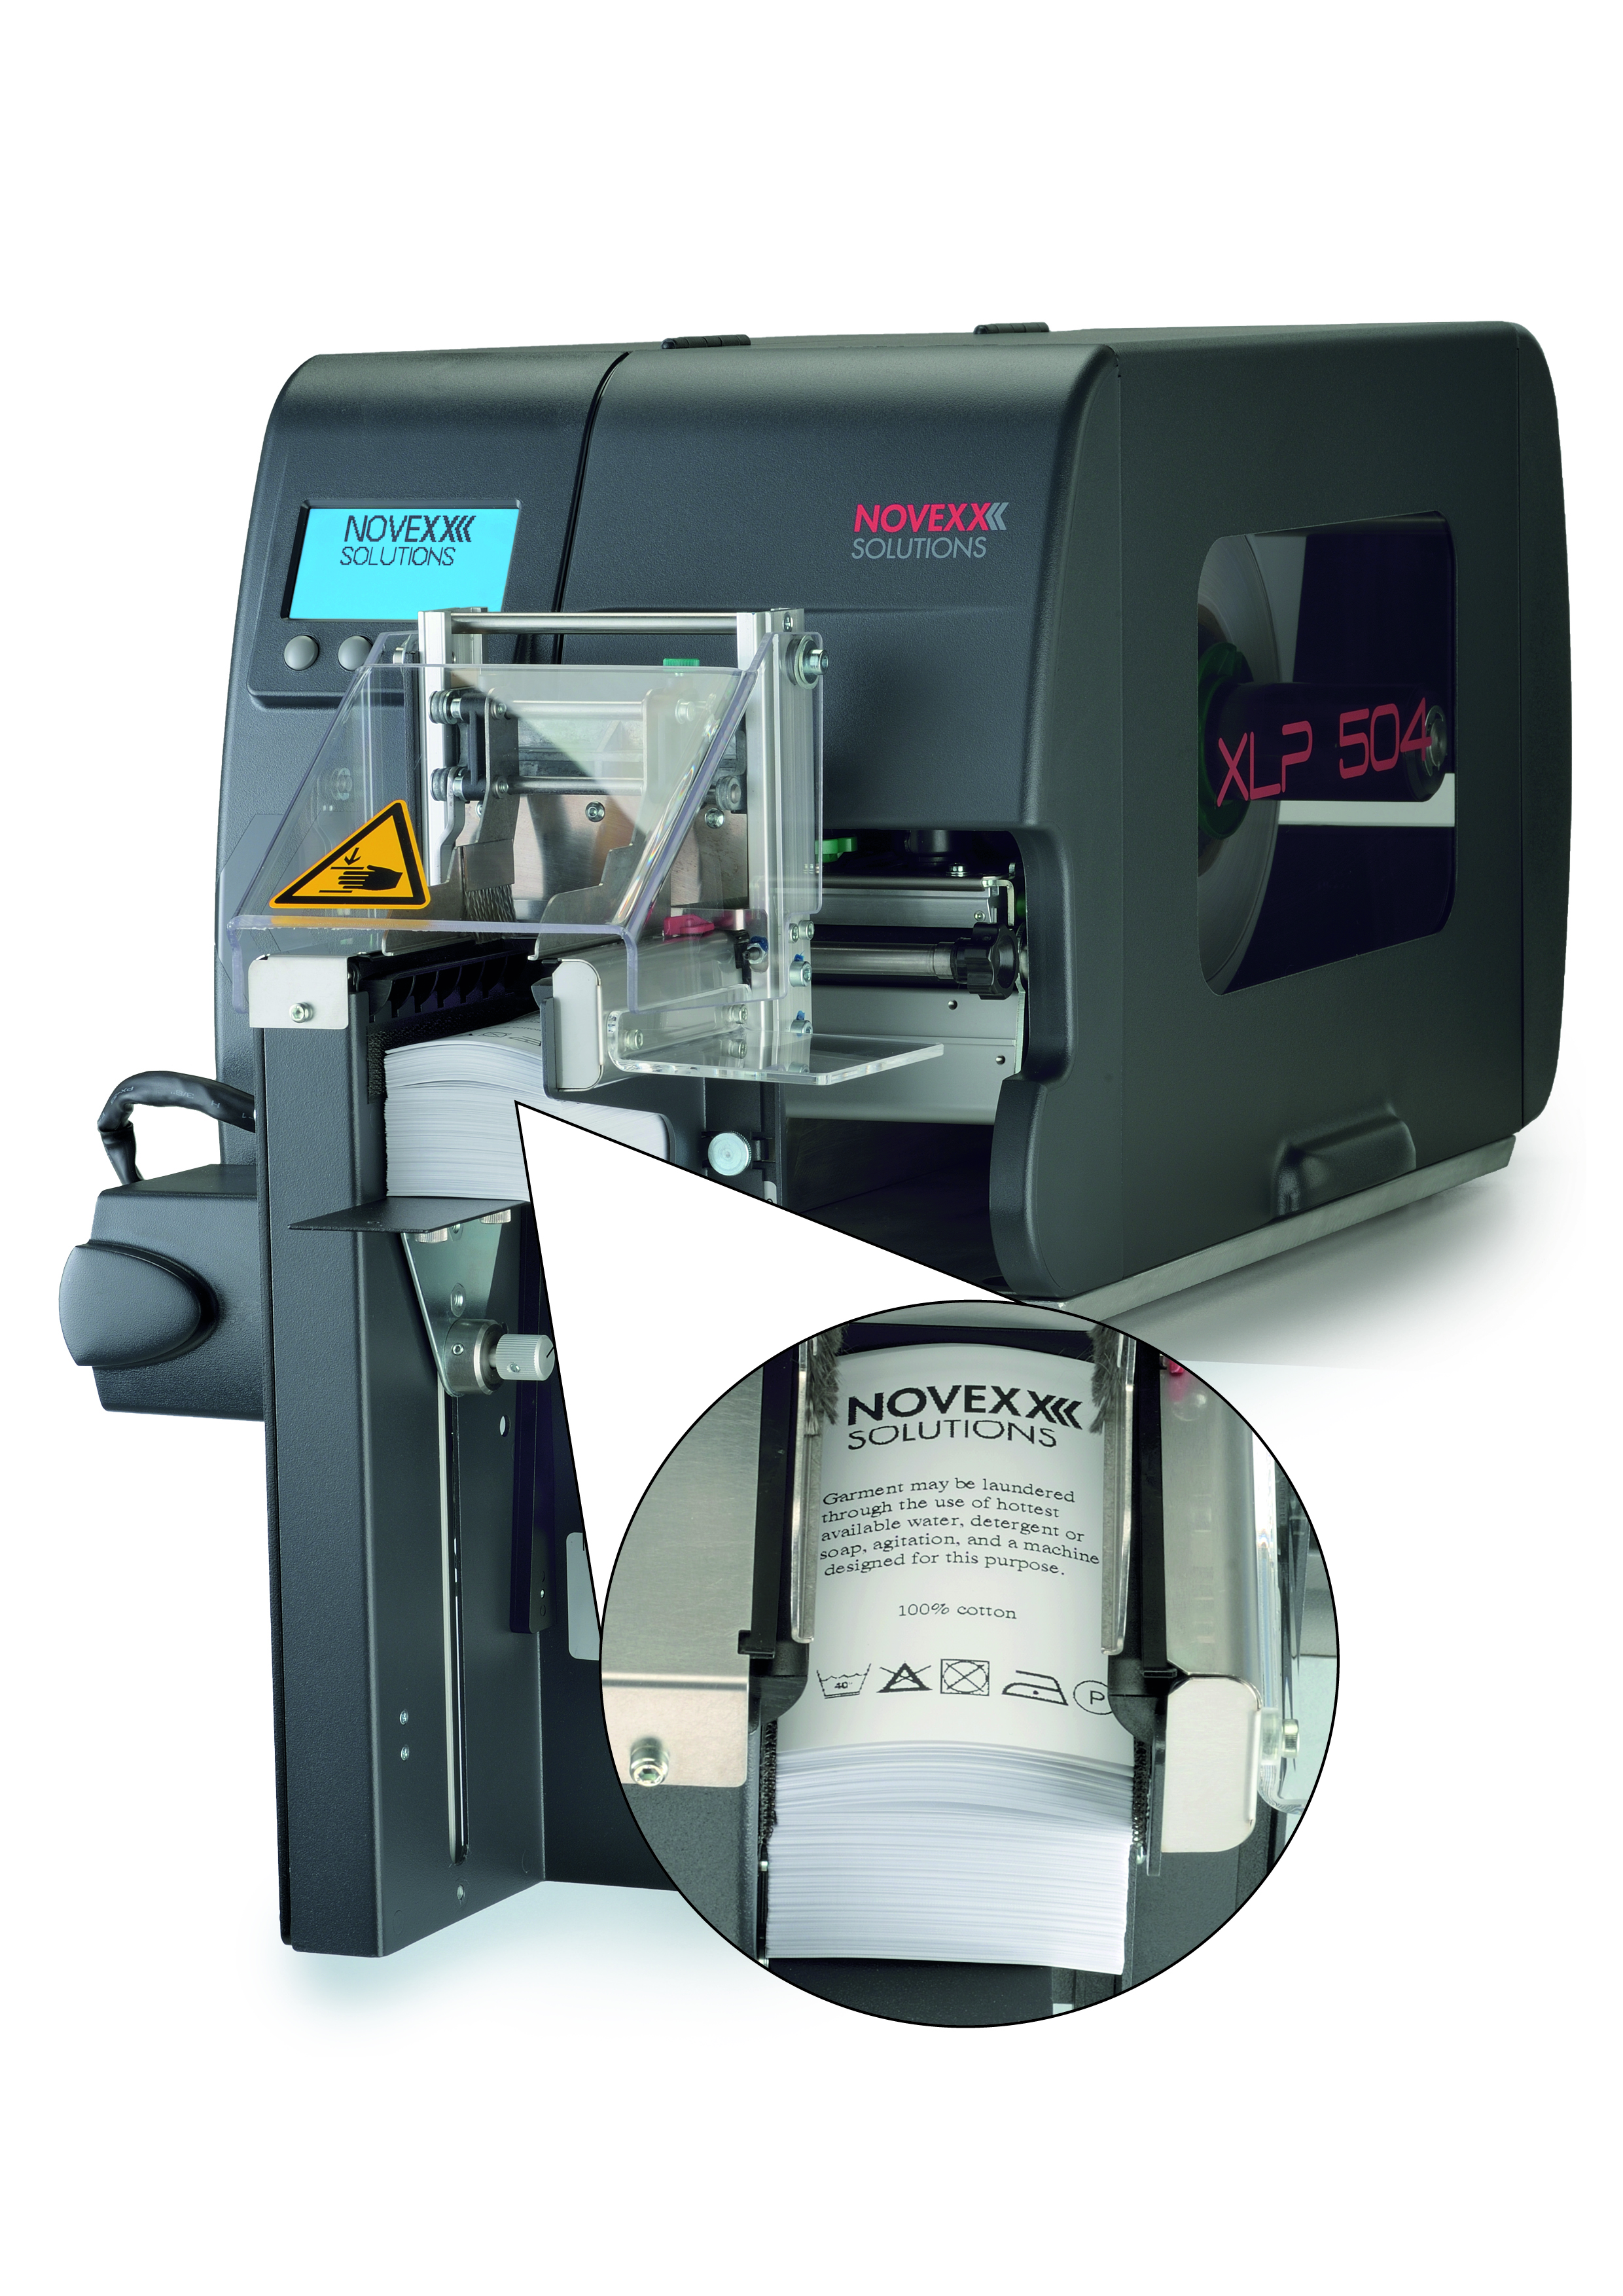 XLP-504-mit-TCS NOVEXX Solutions